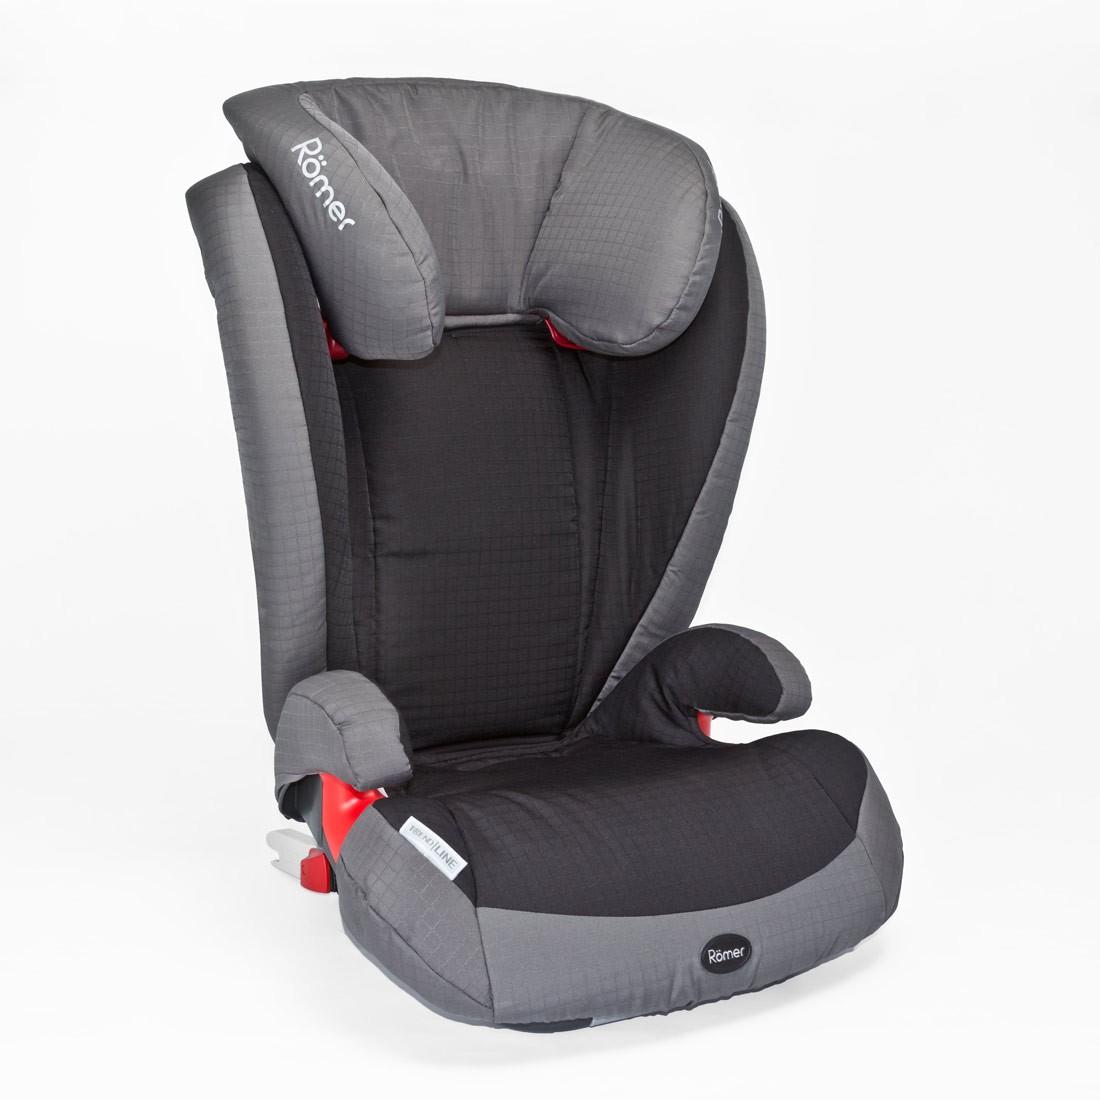 autokindersitz ab 15 kg autokindersitz cybex solution m. Black Bedroom Furniture Sets. Home Design Ideas